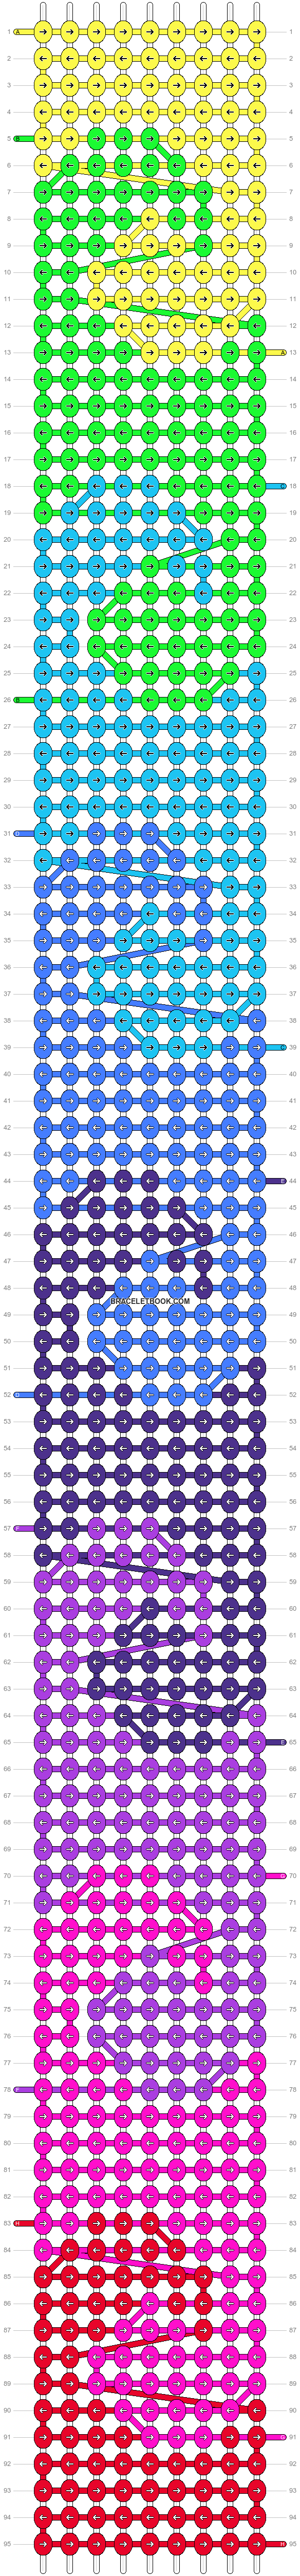 Alpha pattern #23860 pattern